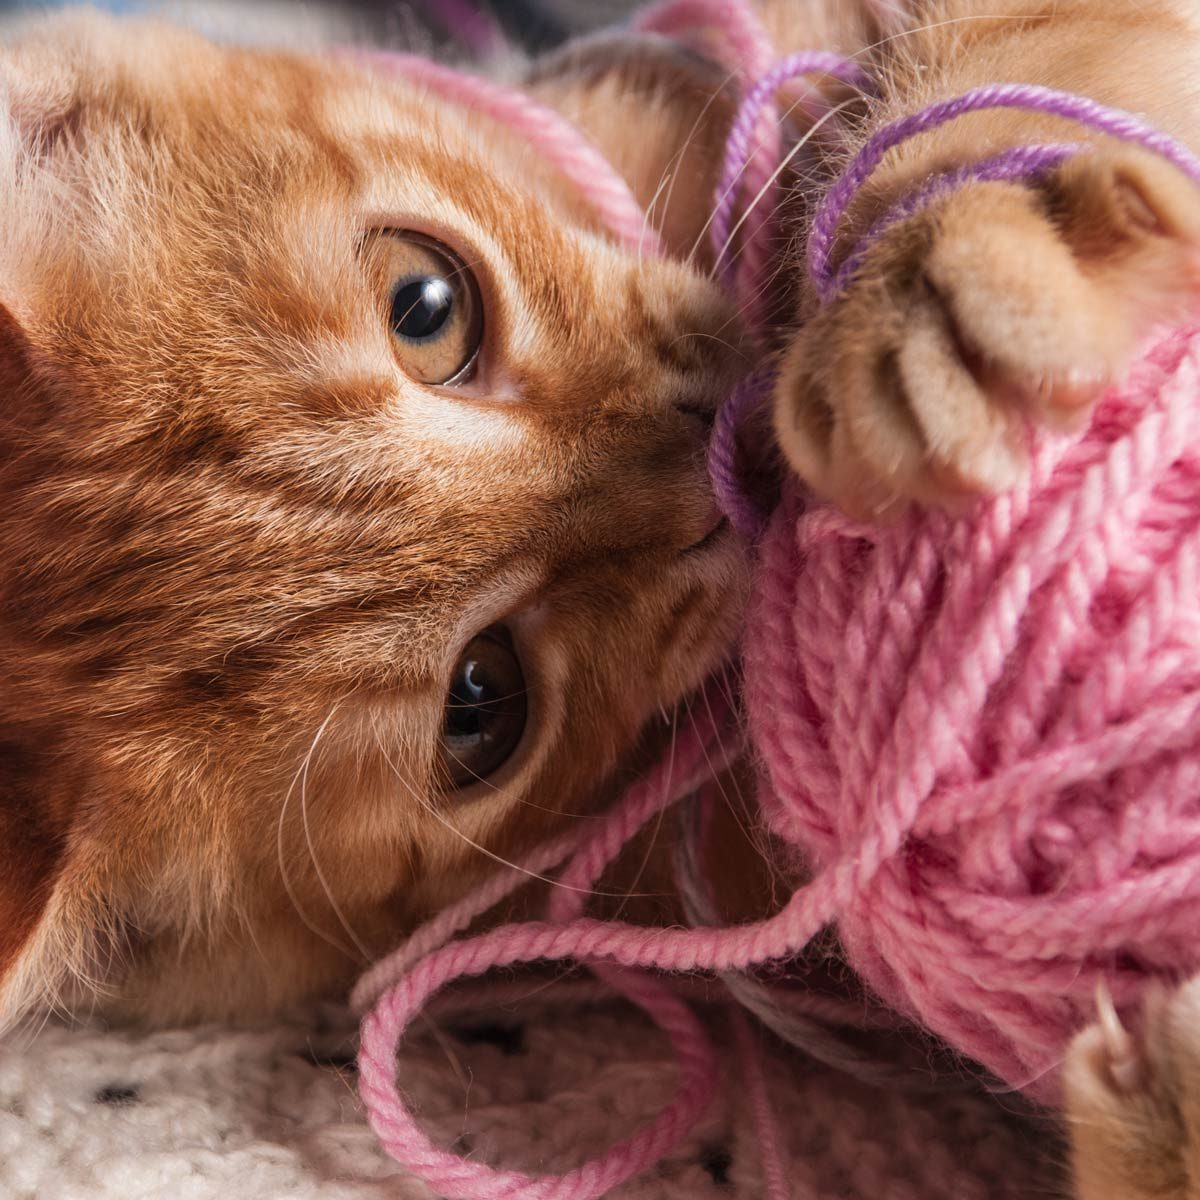 cat with yarn ball